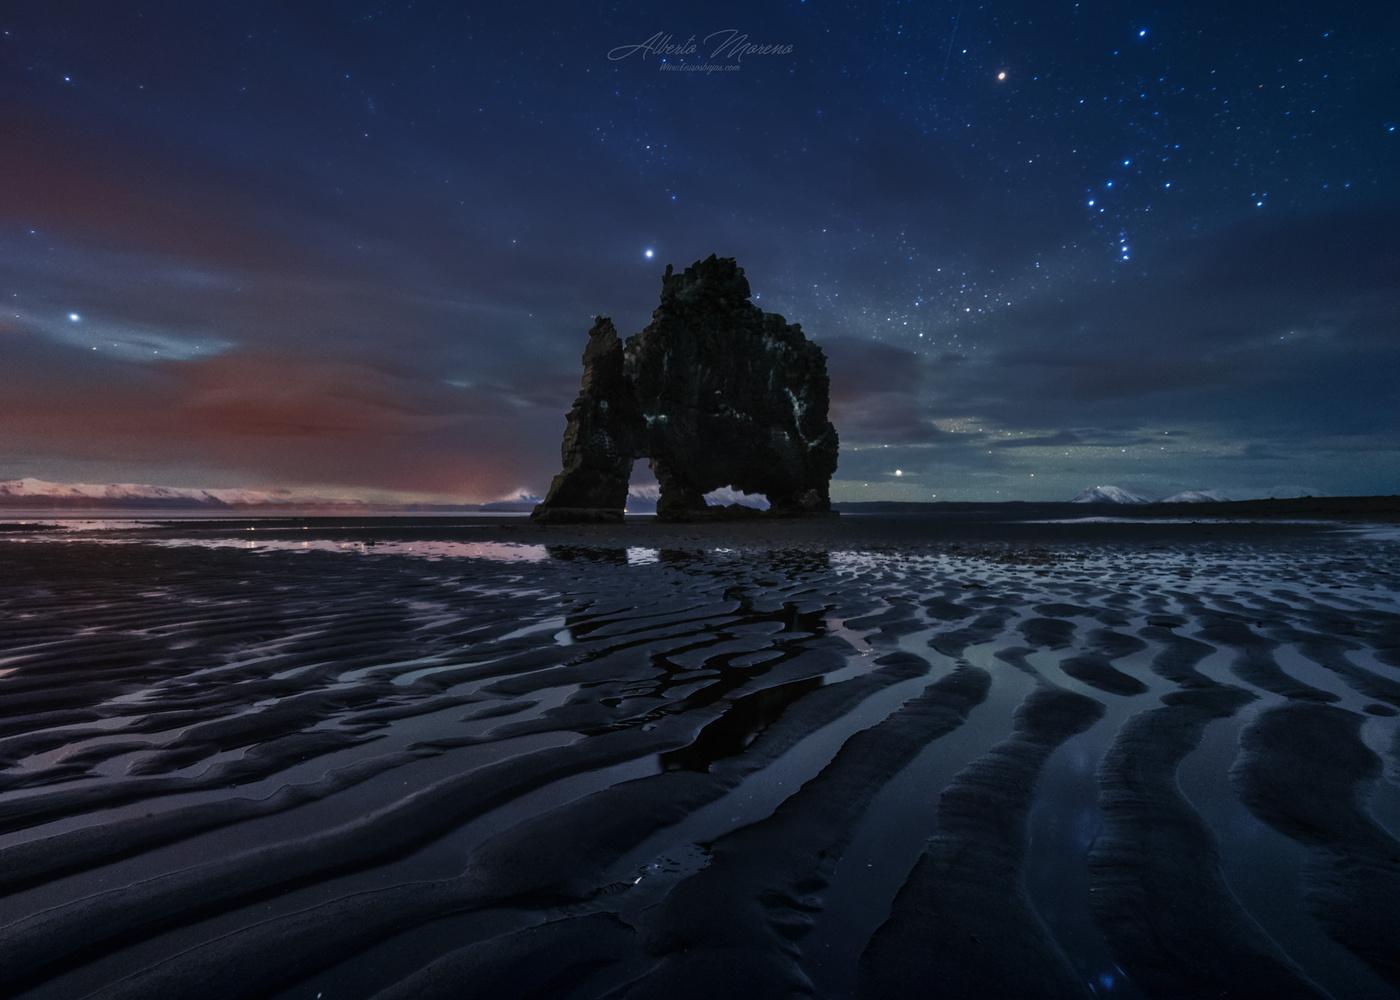 Rhino stars by Alberto Moreno